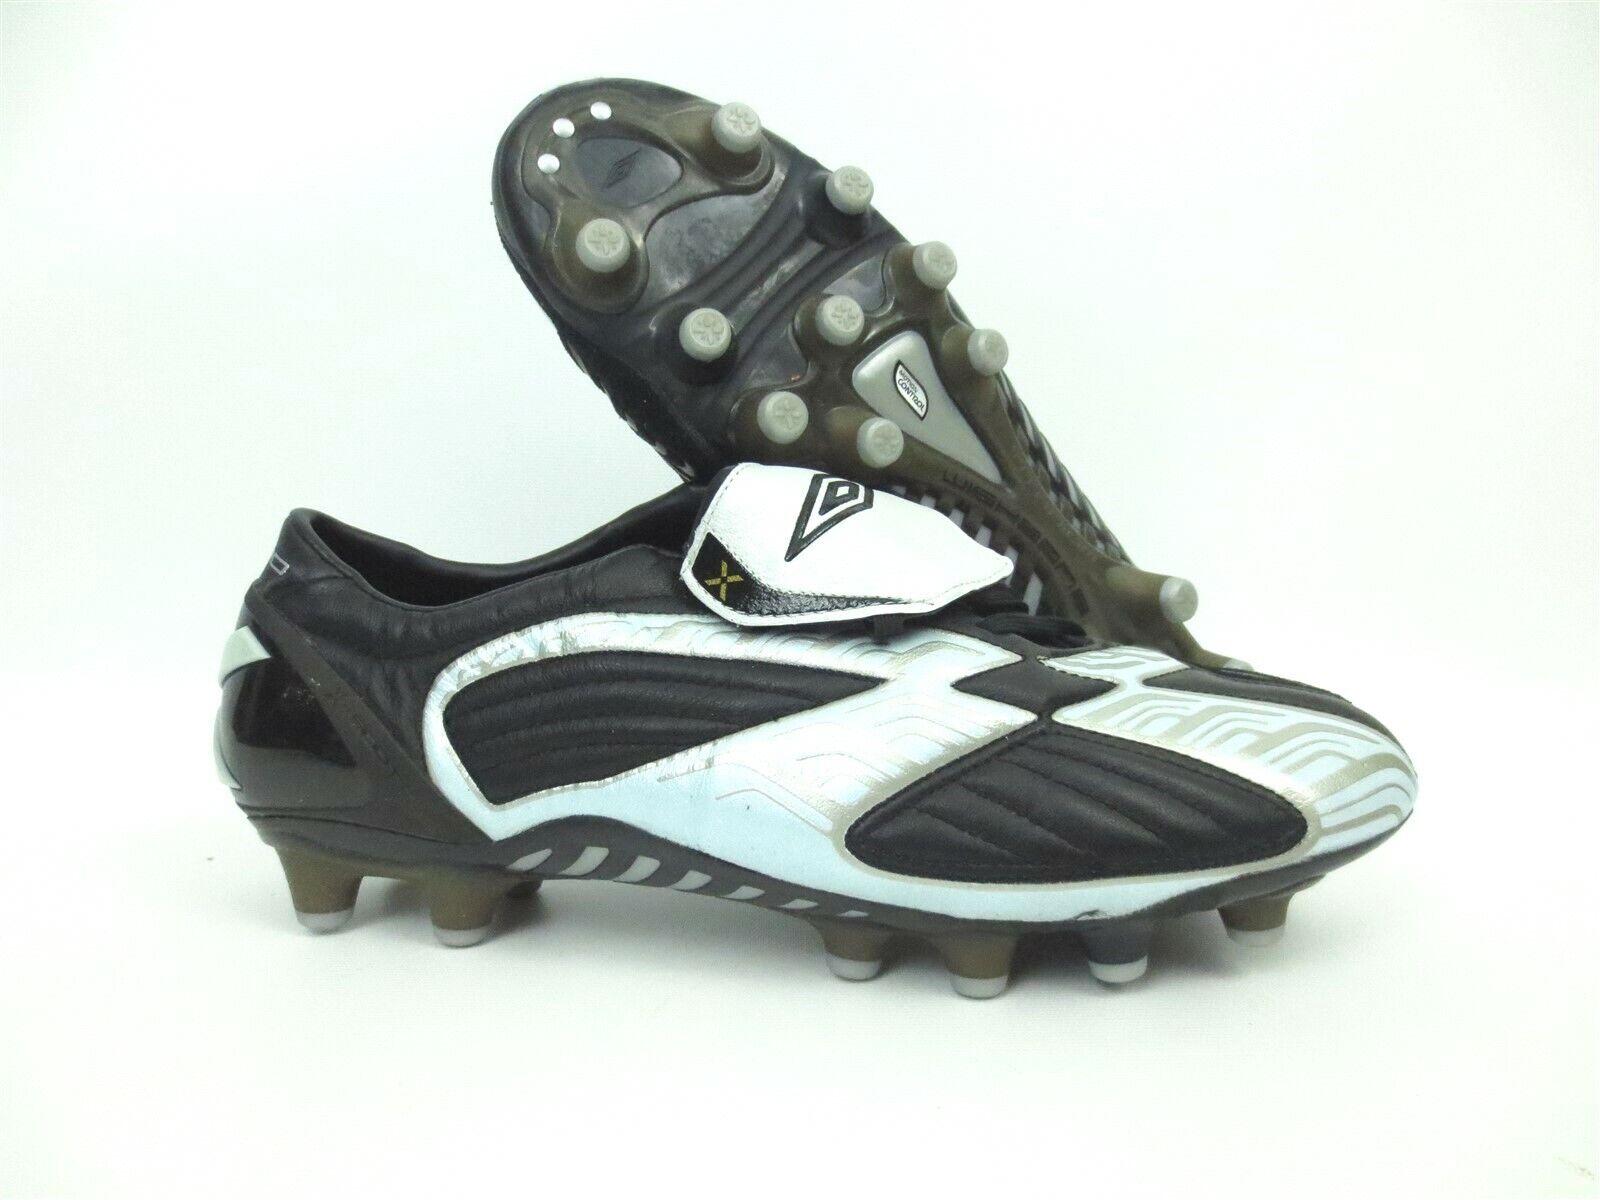 umbro kangaroo leather soccer cleats